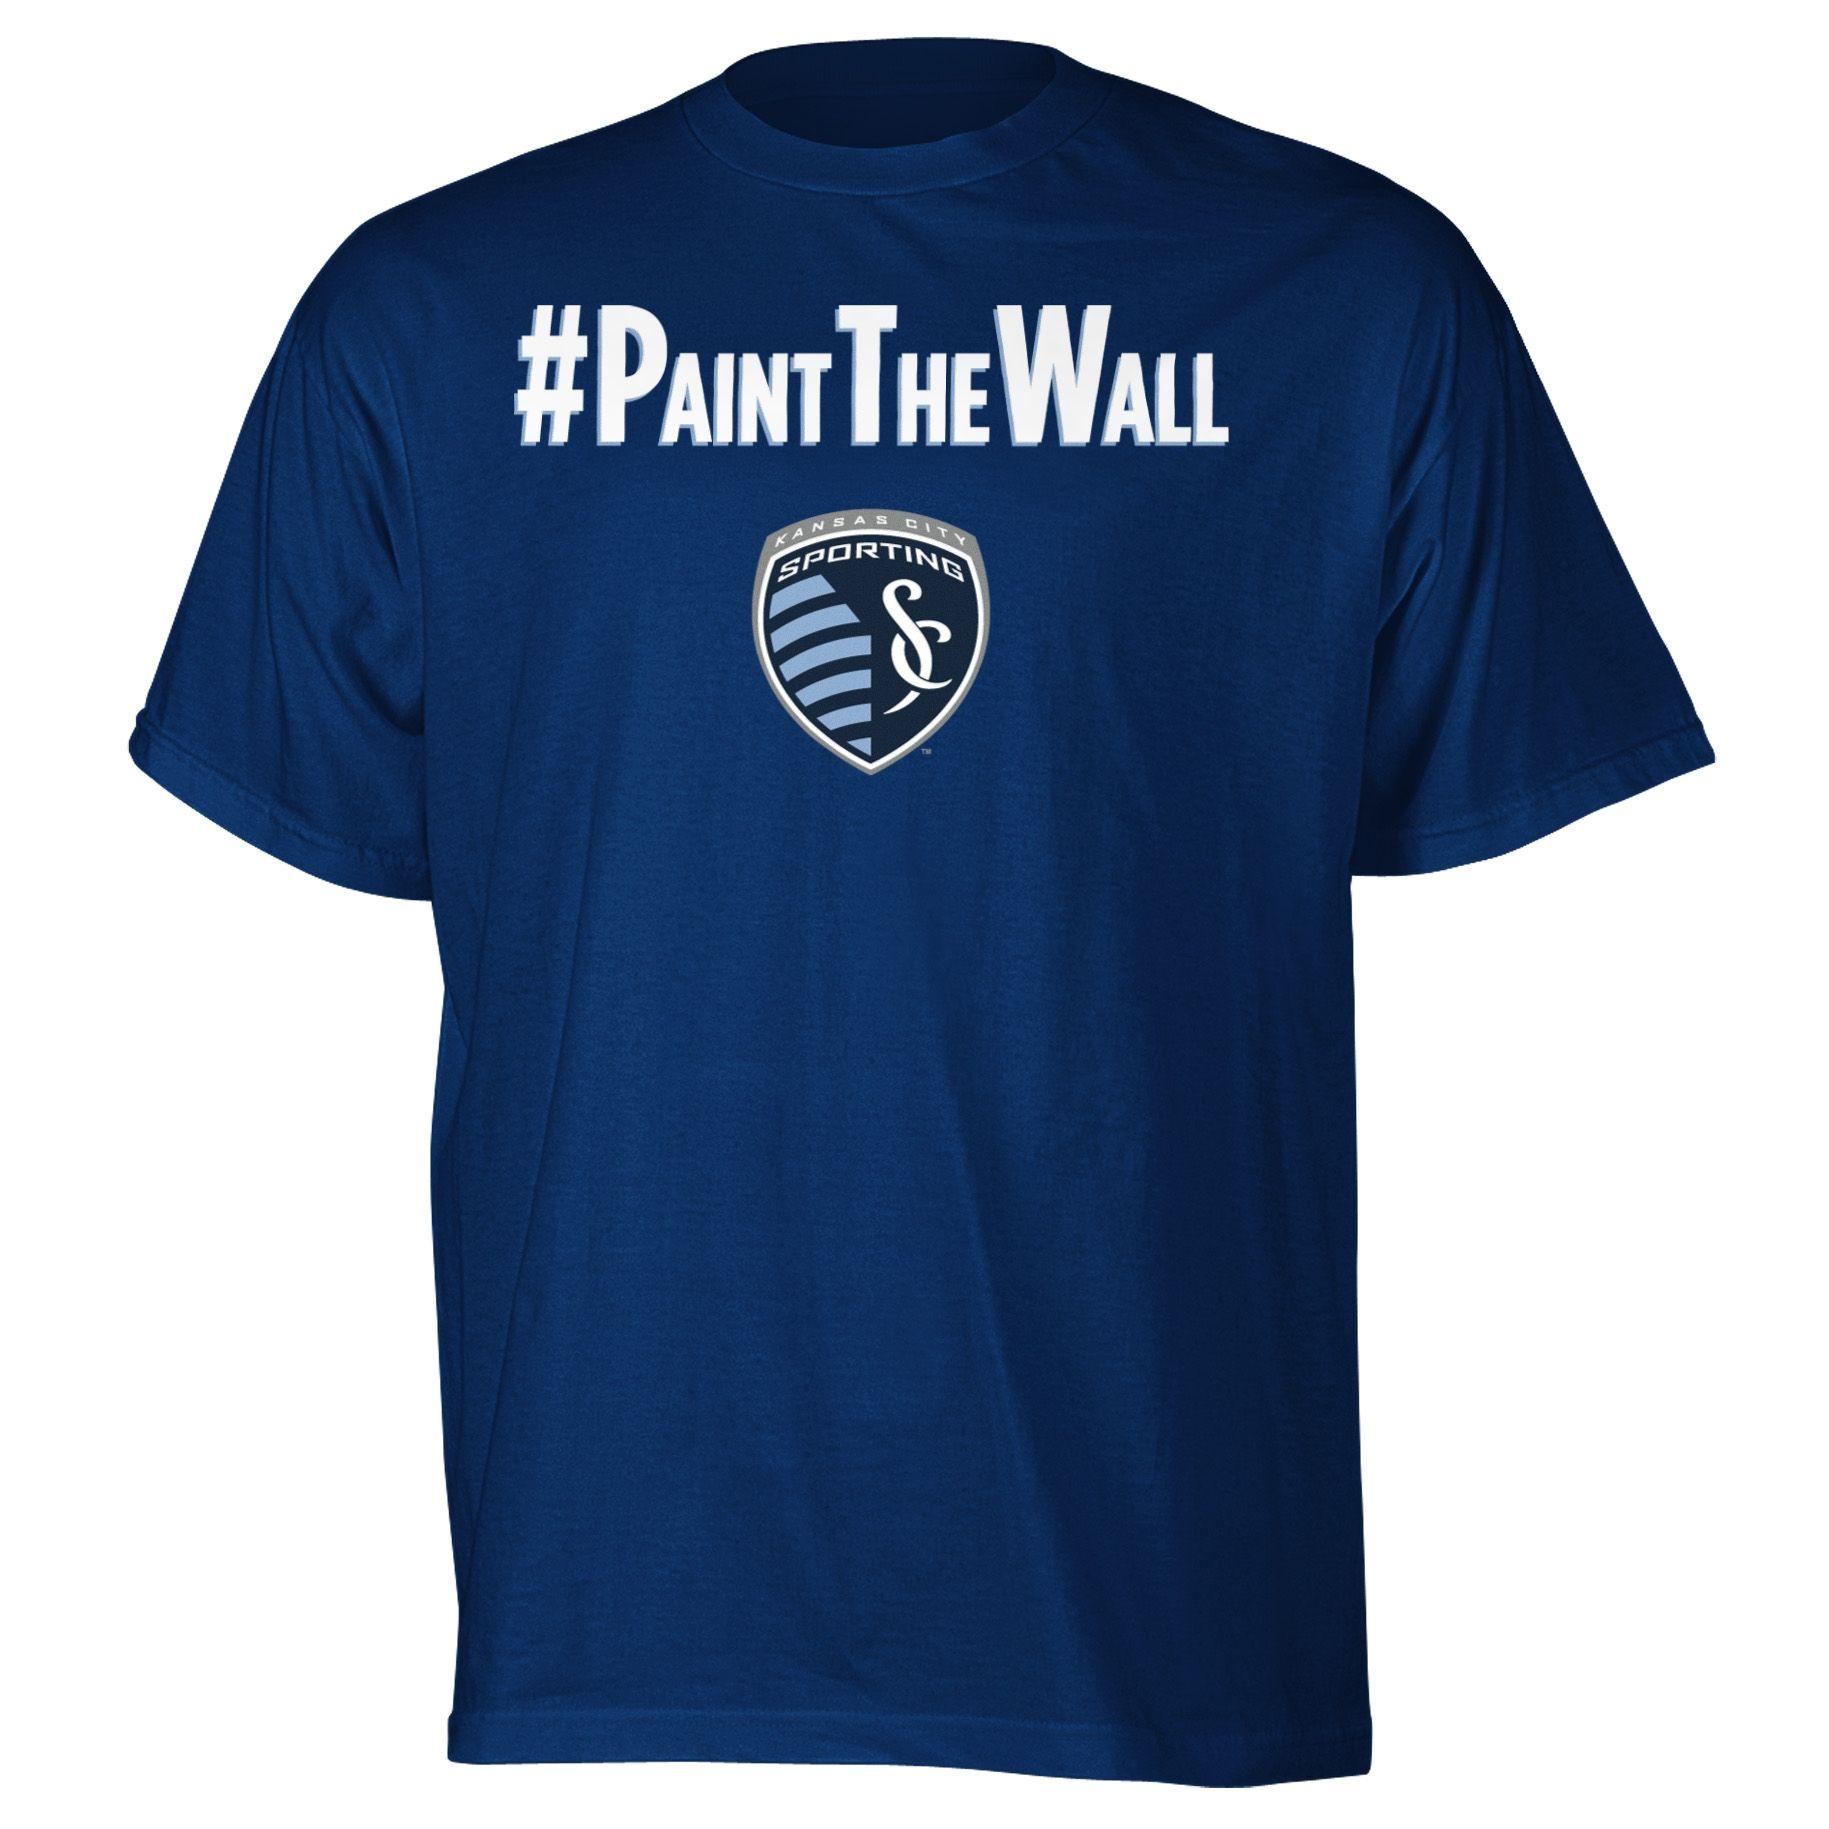 PaintTheWall shirt, Sporting KC! Sporting kc, T shirt